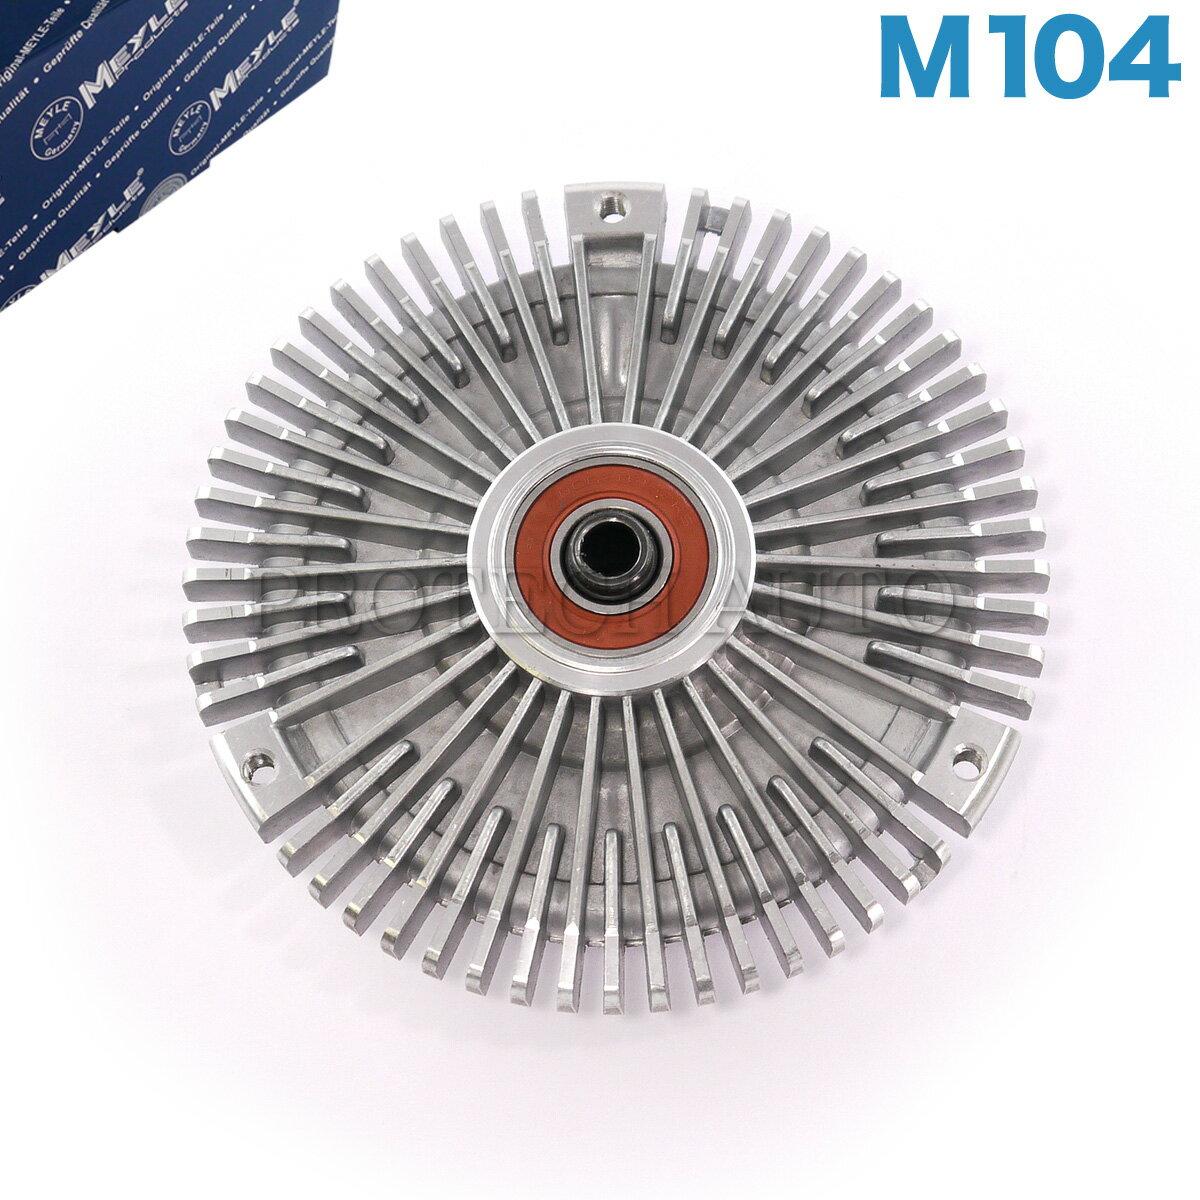 MEYLE製 ベンツ SLクラス R129 ファンクラッチカップリング/ファンドライブ M104 エンジン用 1032000622 SL320【あす楽対応】